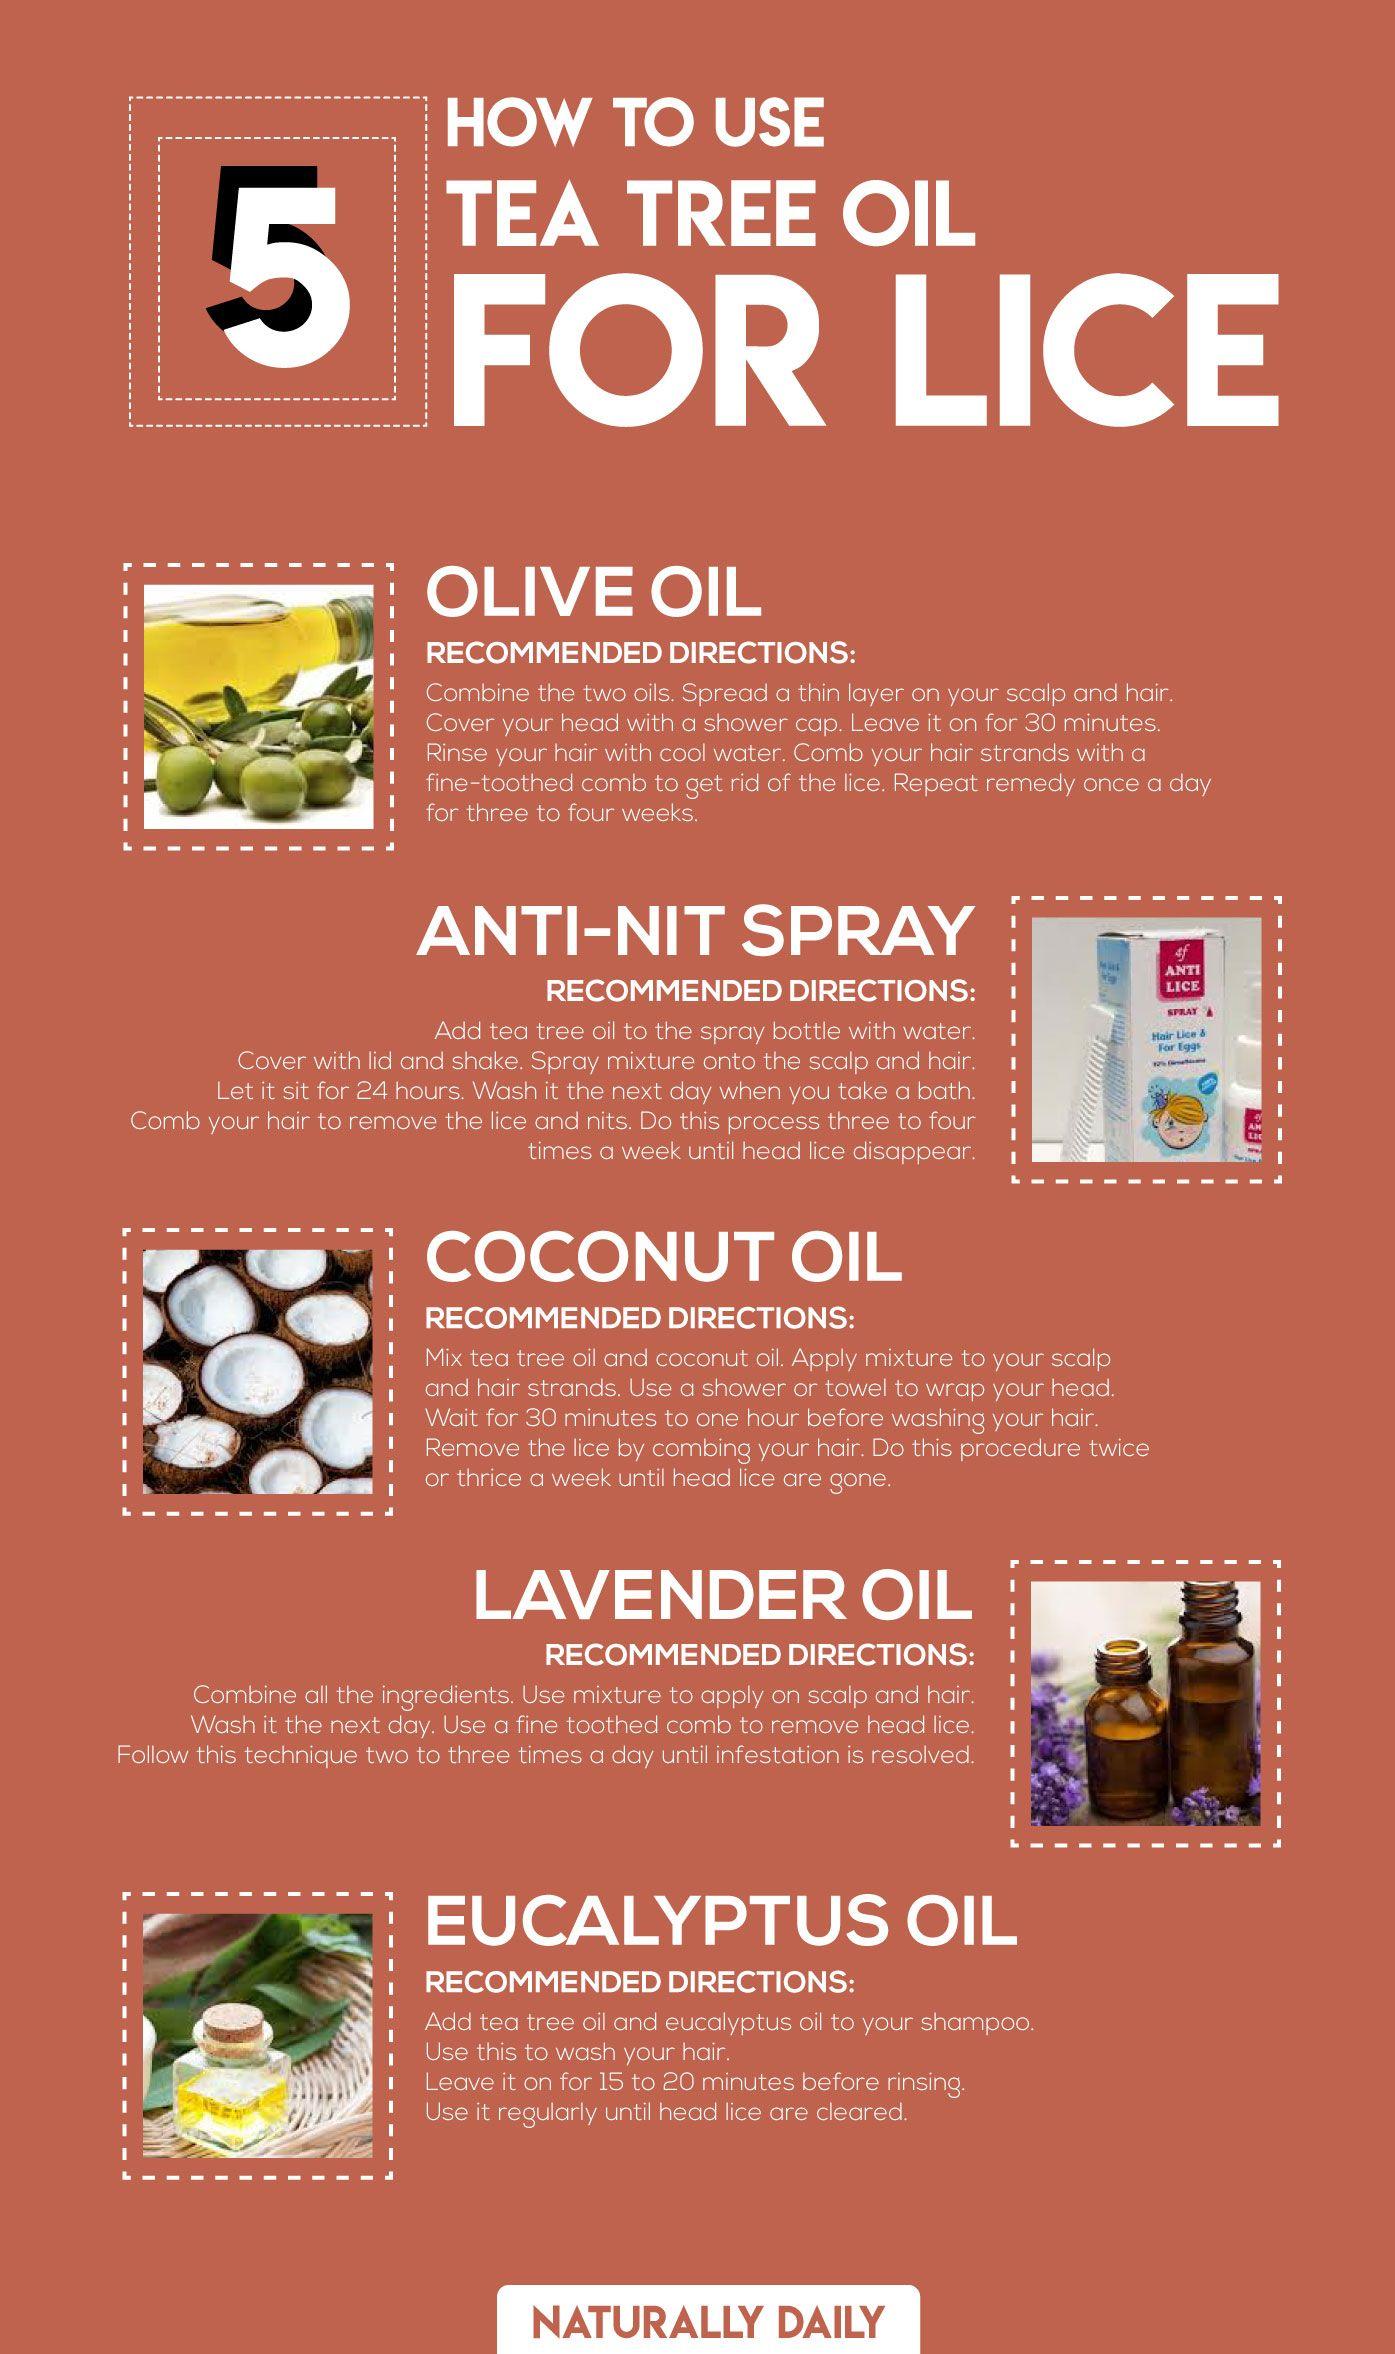 9c669d75a0335d1198b6bf74658007c7 - How To Get Rid Of Head Lice With Baby Oil